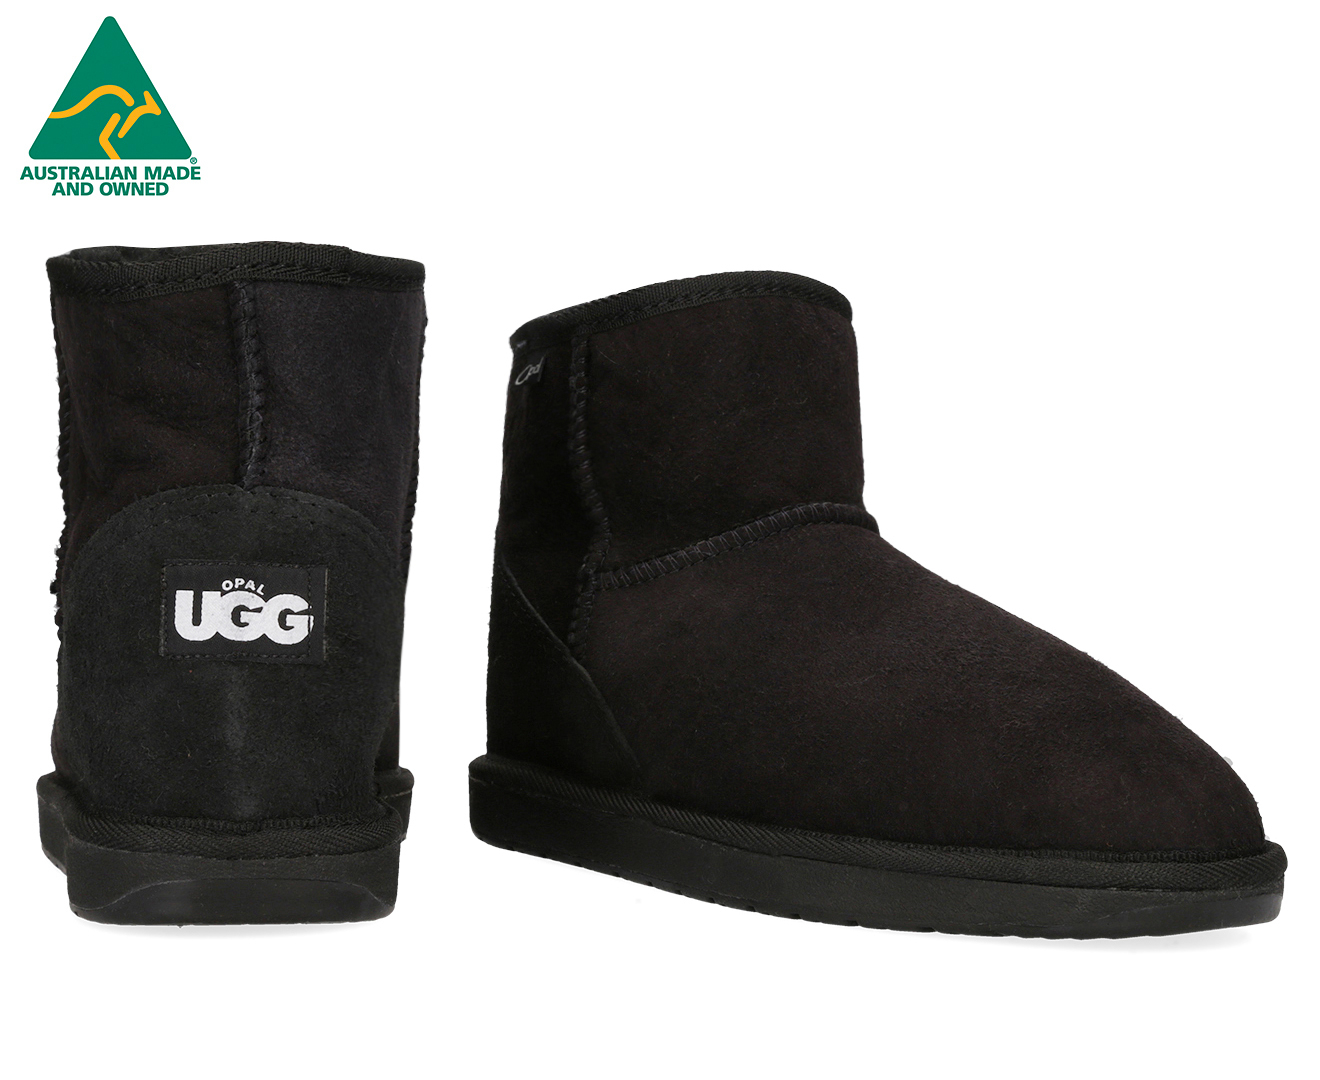 3b2529bb1e7 Details about Opal UGG Australian Made Mini Opal Sheepskin Boots - Black